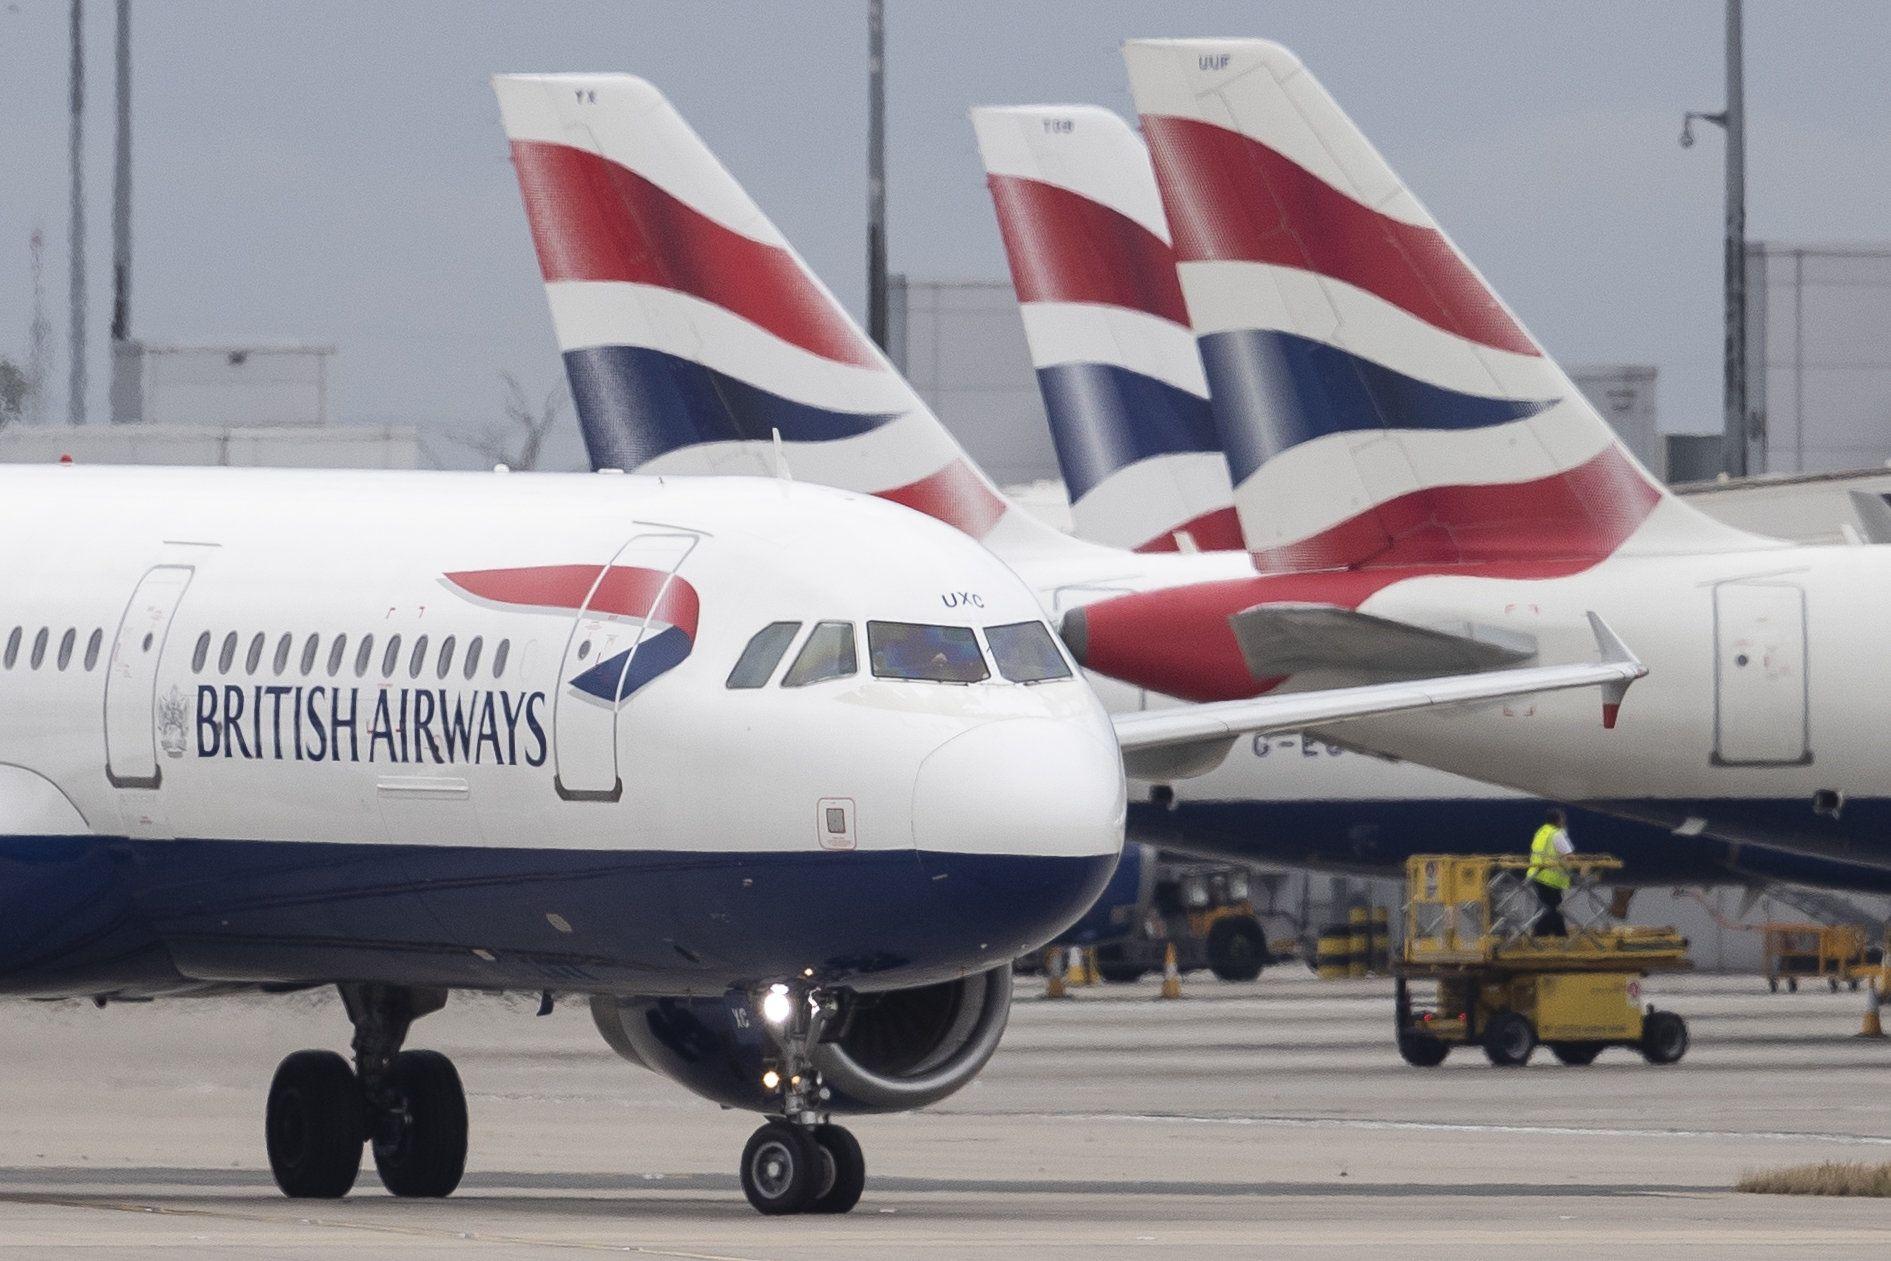 British Airways Cancels Almost All Flights Over Pilot Strike